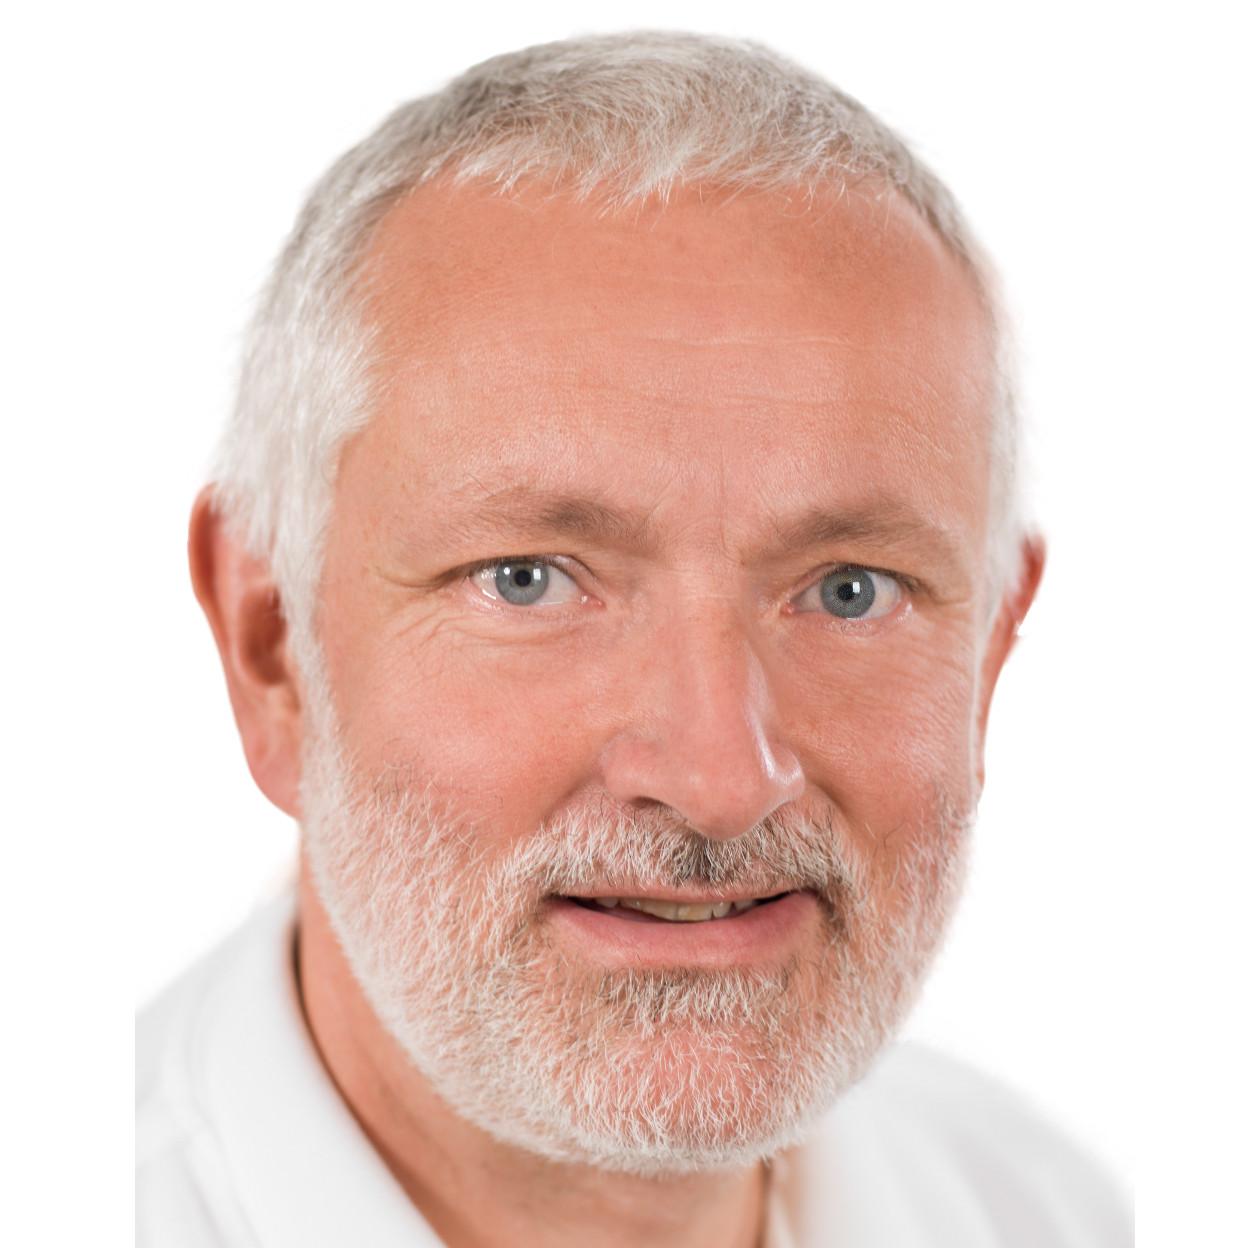 Dr. Burchard John Hausarztteam Schönebeck Lessingstraße